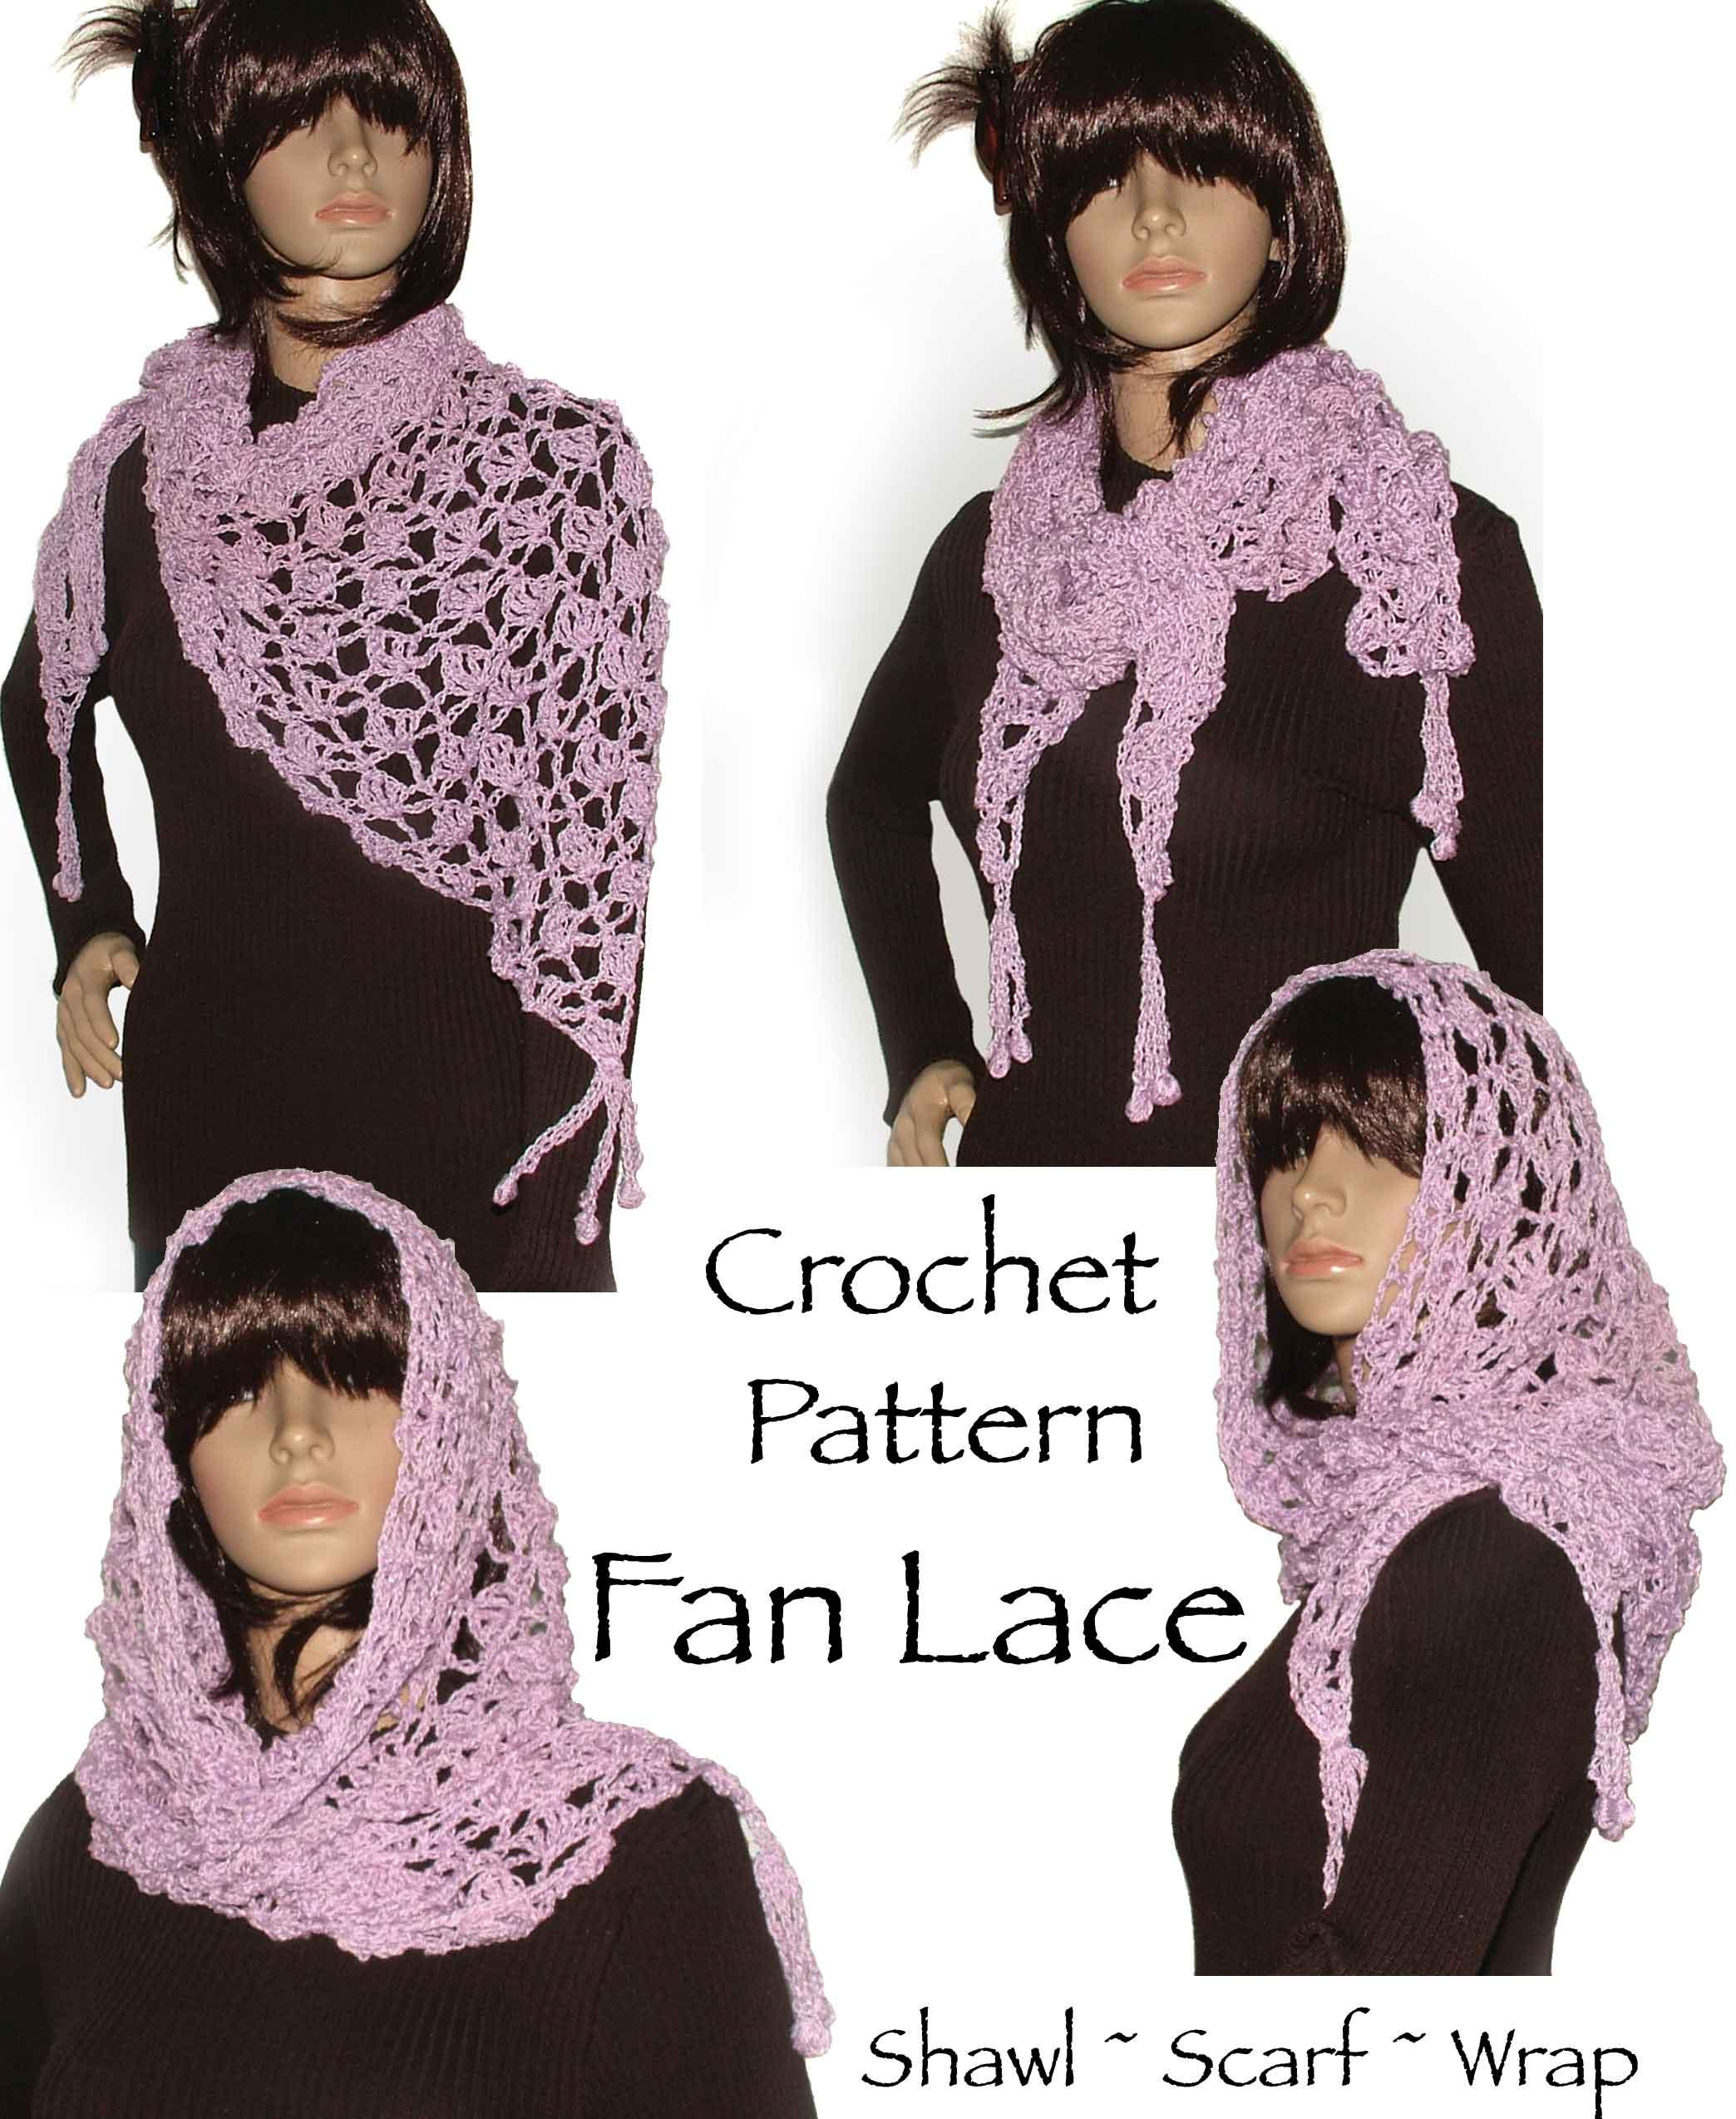 Triangular Crochet Lace Pattern For Scarf Shawl Wrap Renate Kirkpatrick S Freeform Crochet Knit Fibre Designs,Glass Noodles Wide